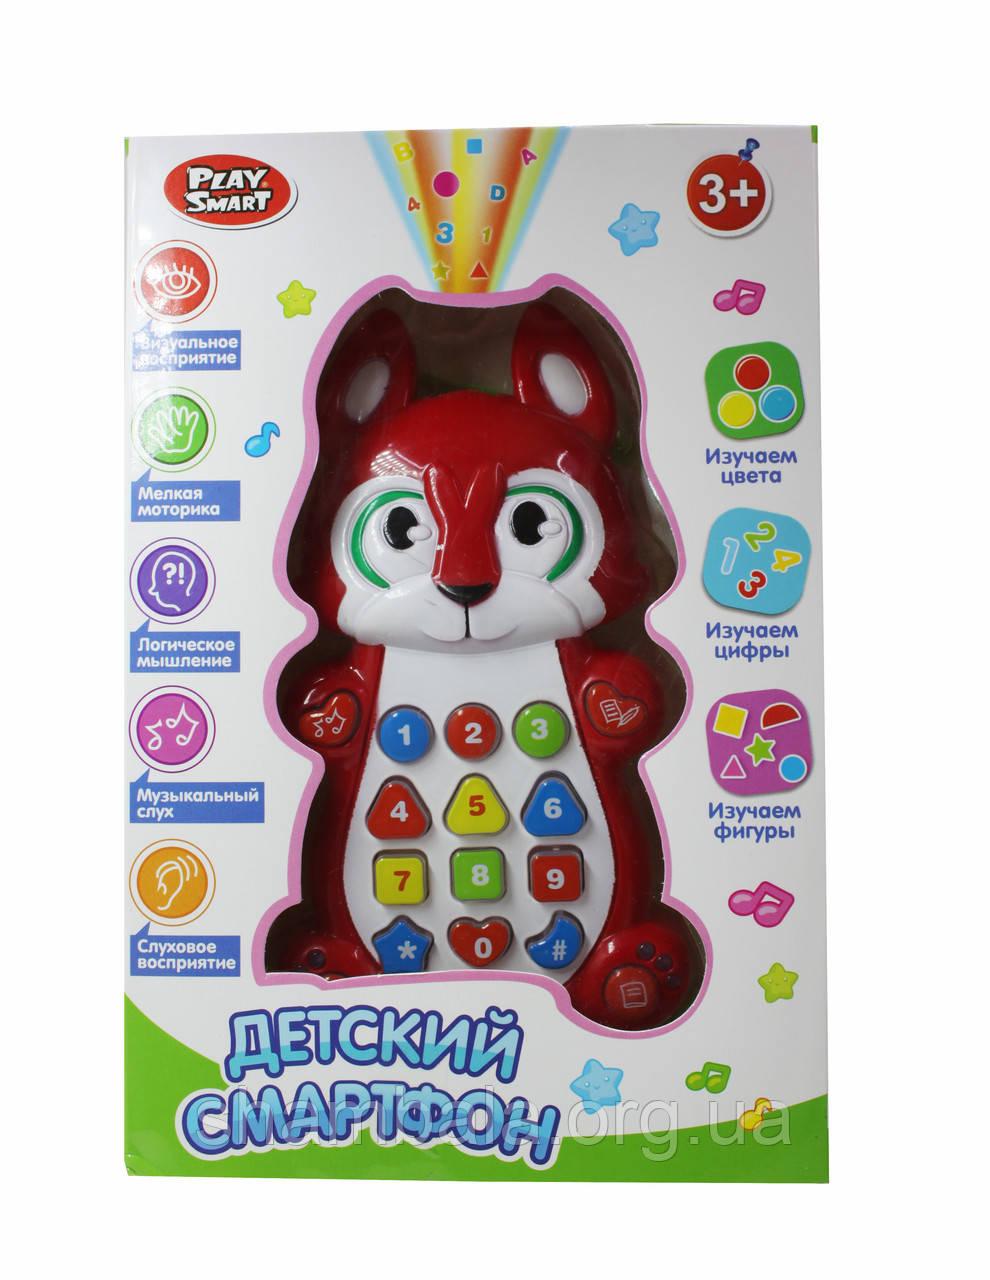 Детский смартфон  Play smart (070070)